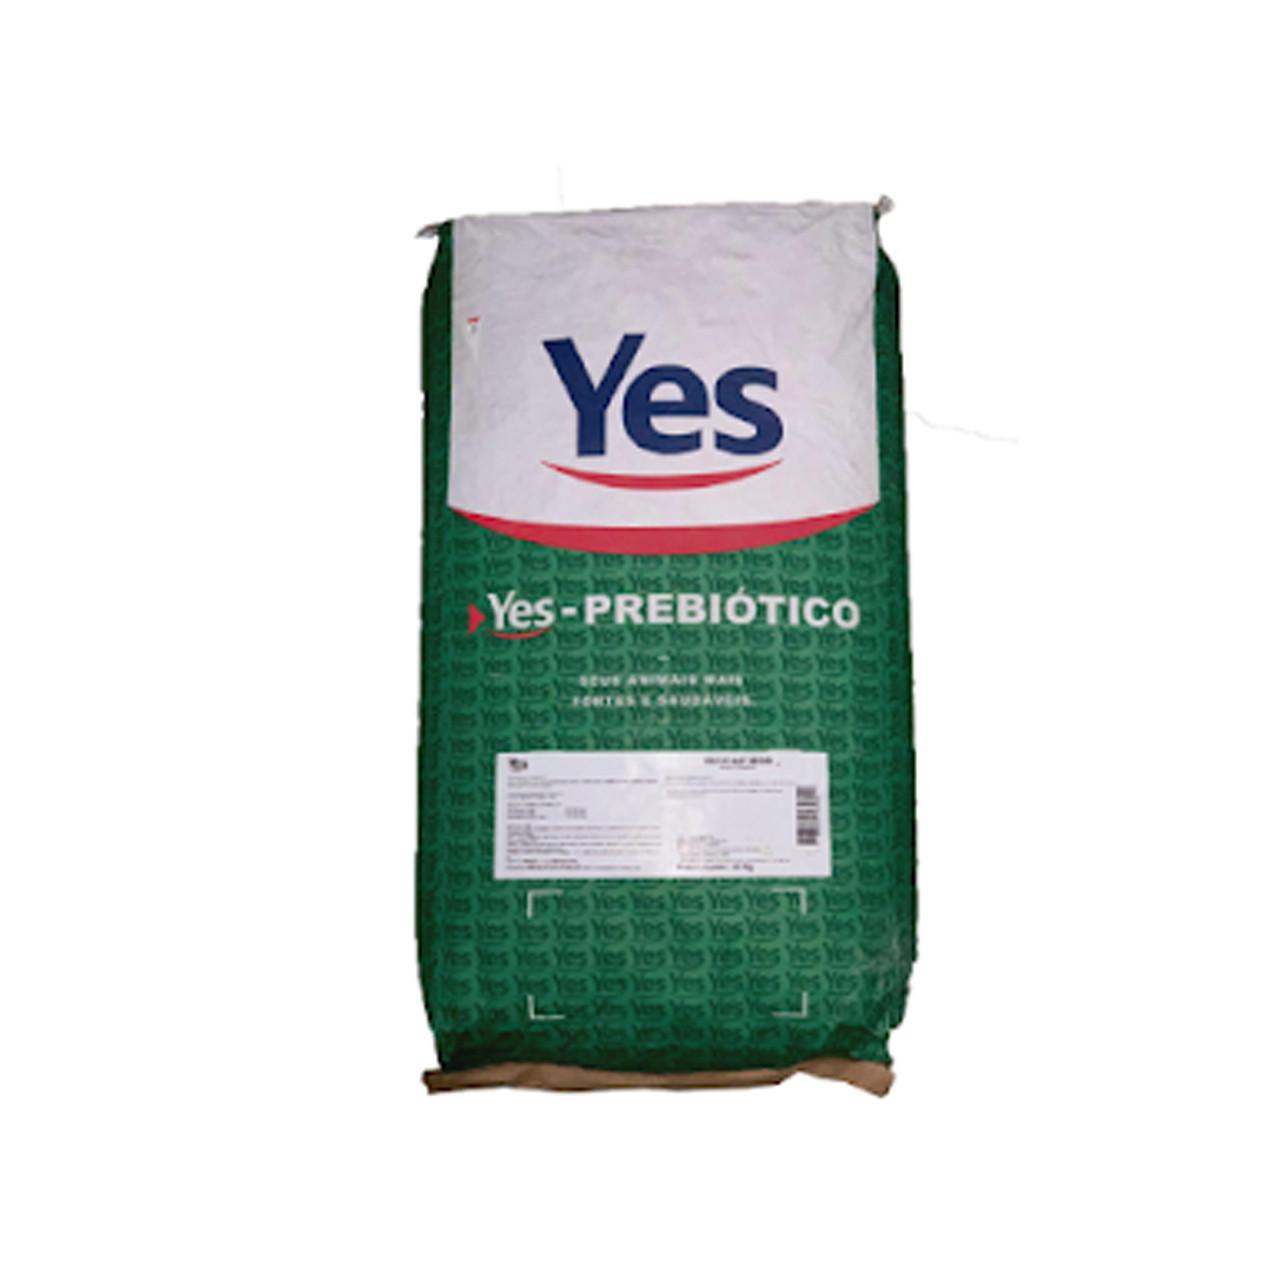 Glucan MOS prebiótico base levadura Yes